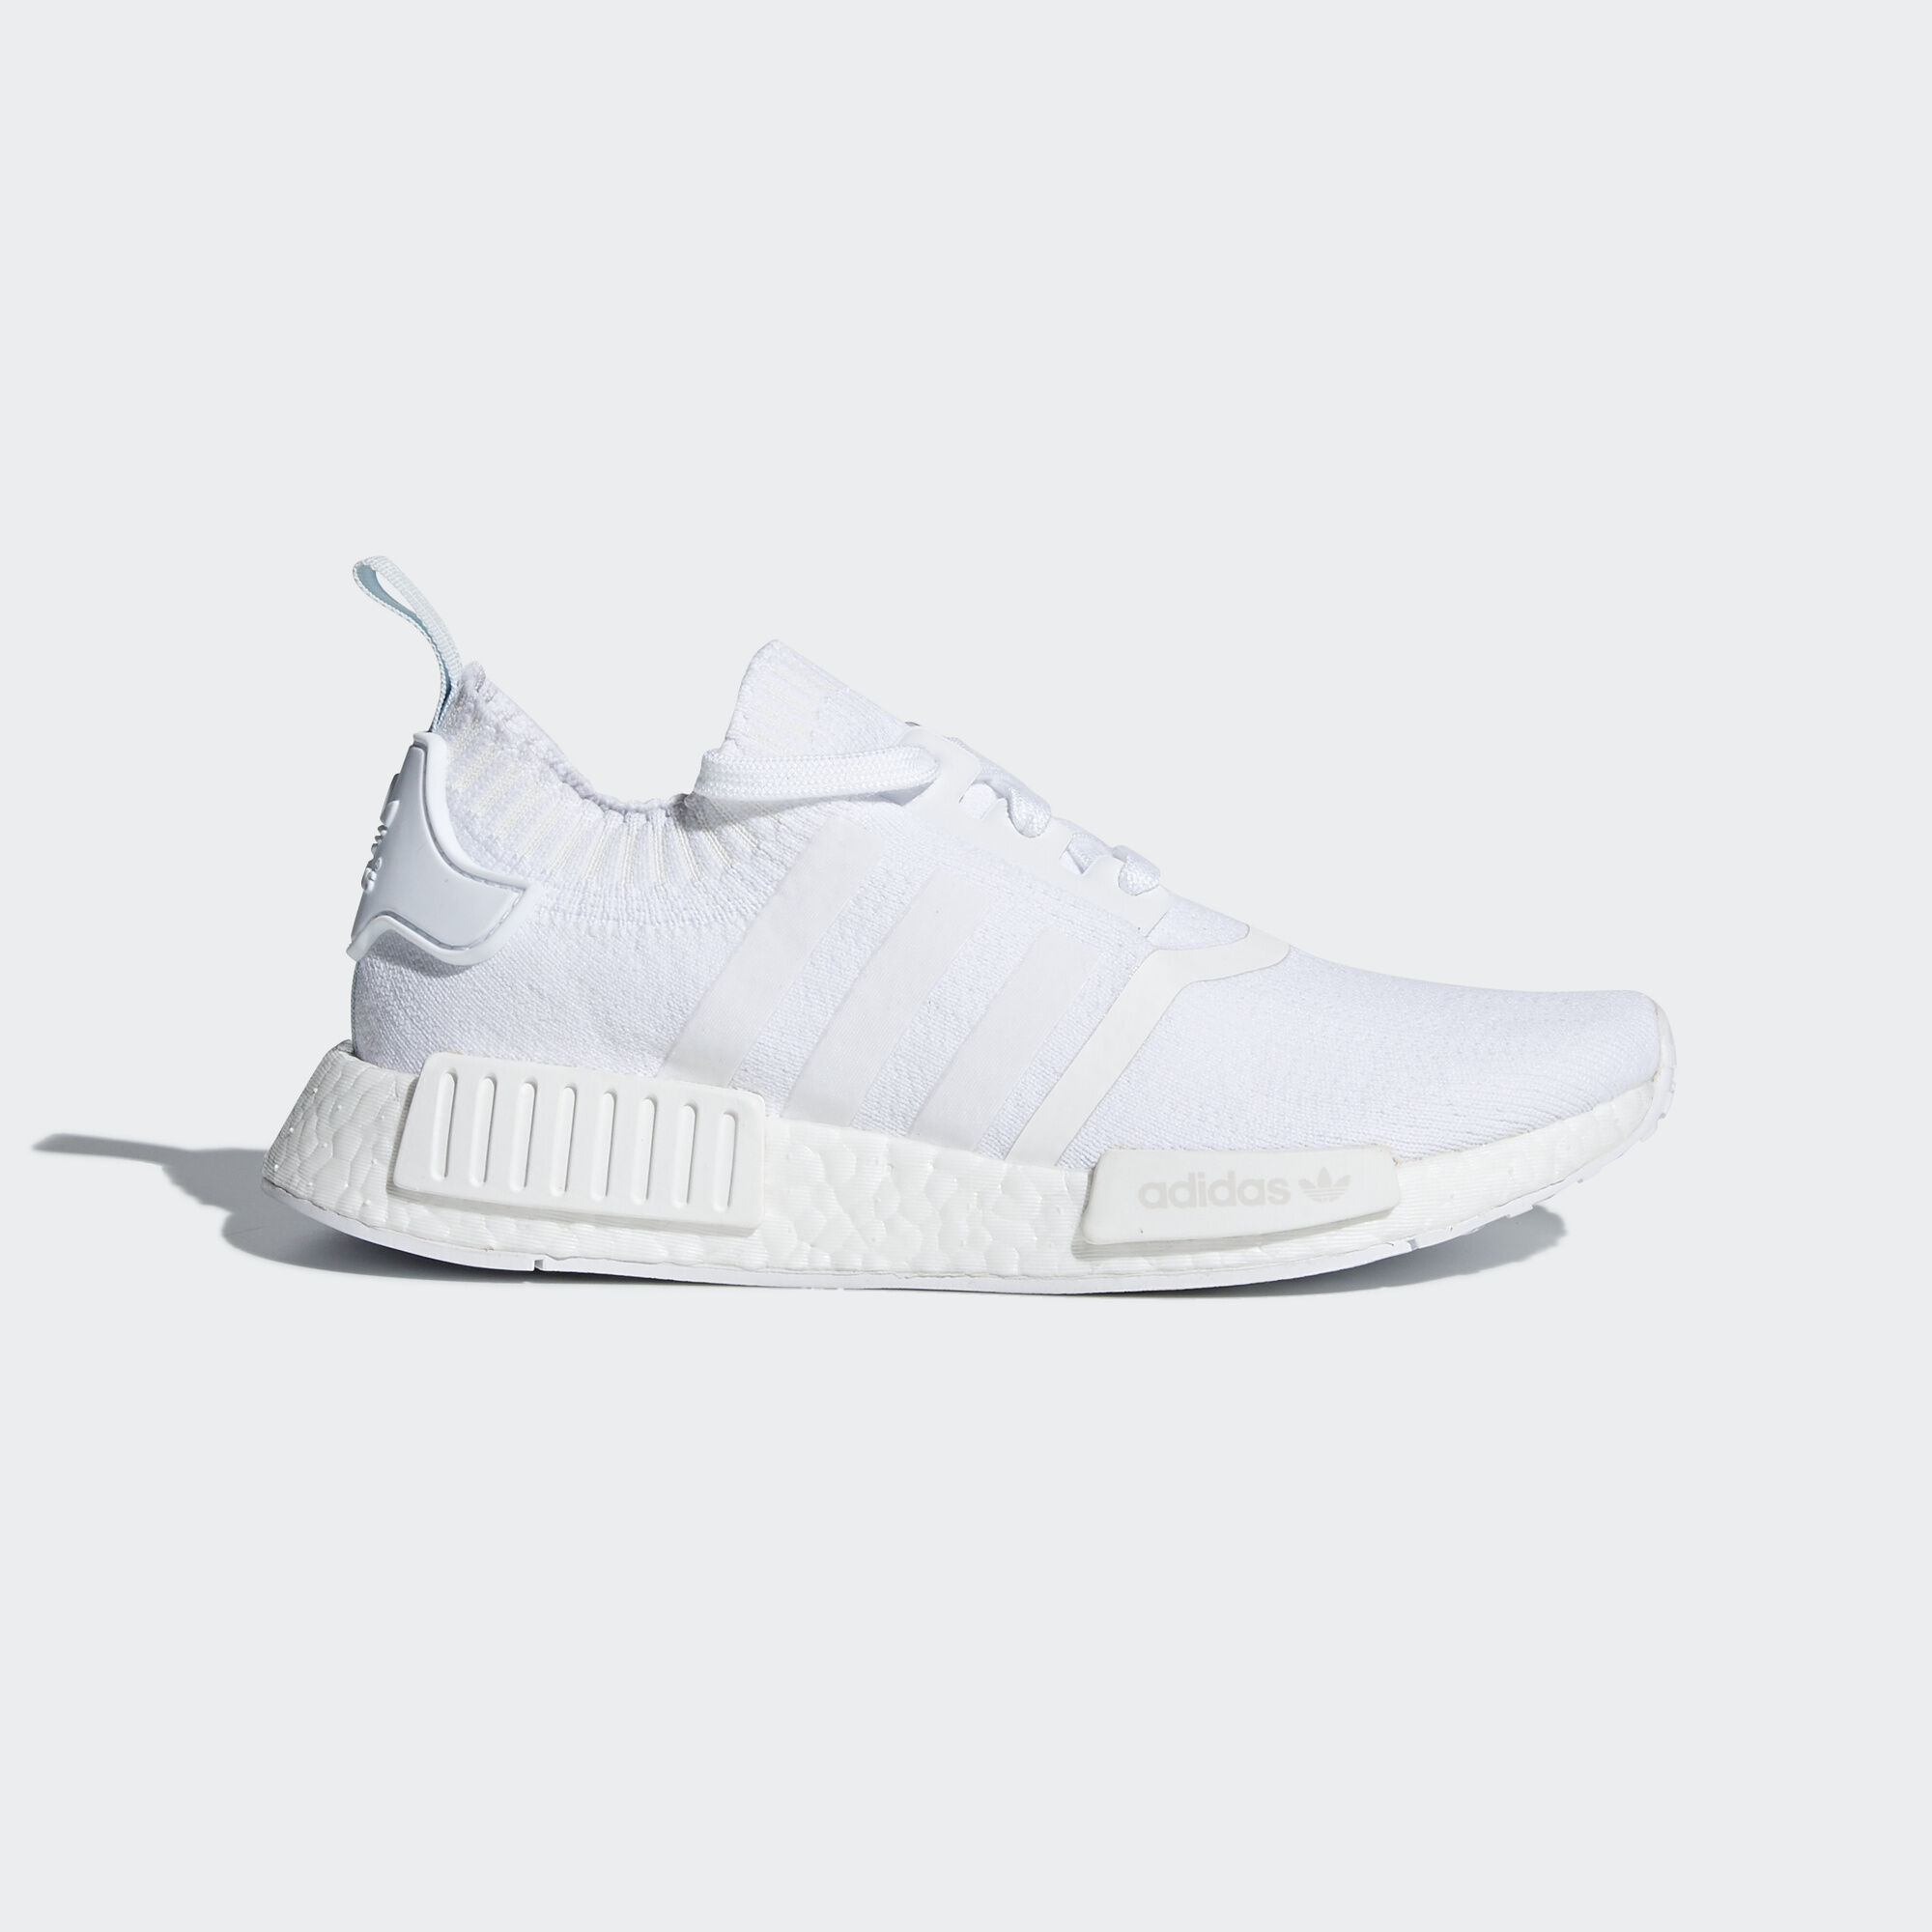 adidas - NMD_R1 Primeknit Shoes Ftwr White/Ftwr White/Blue Tint CQ2040 ...